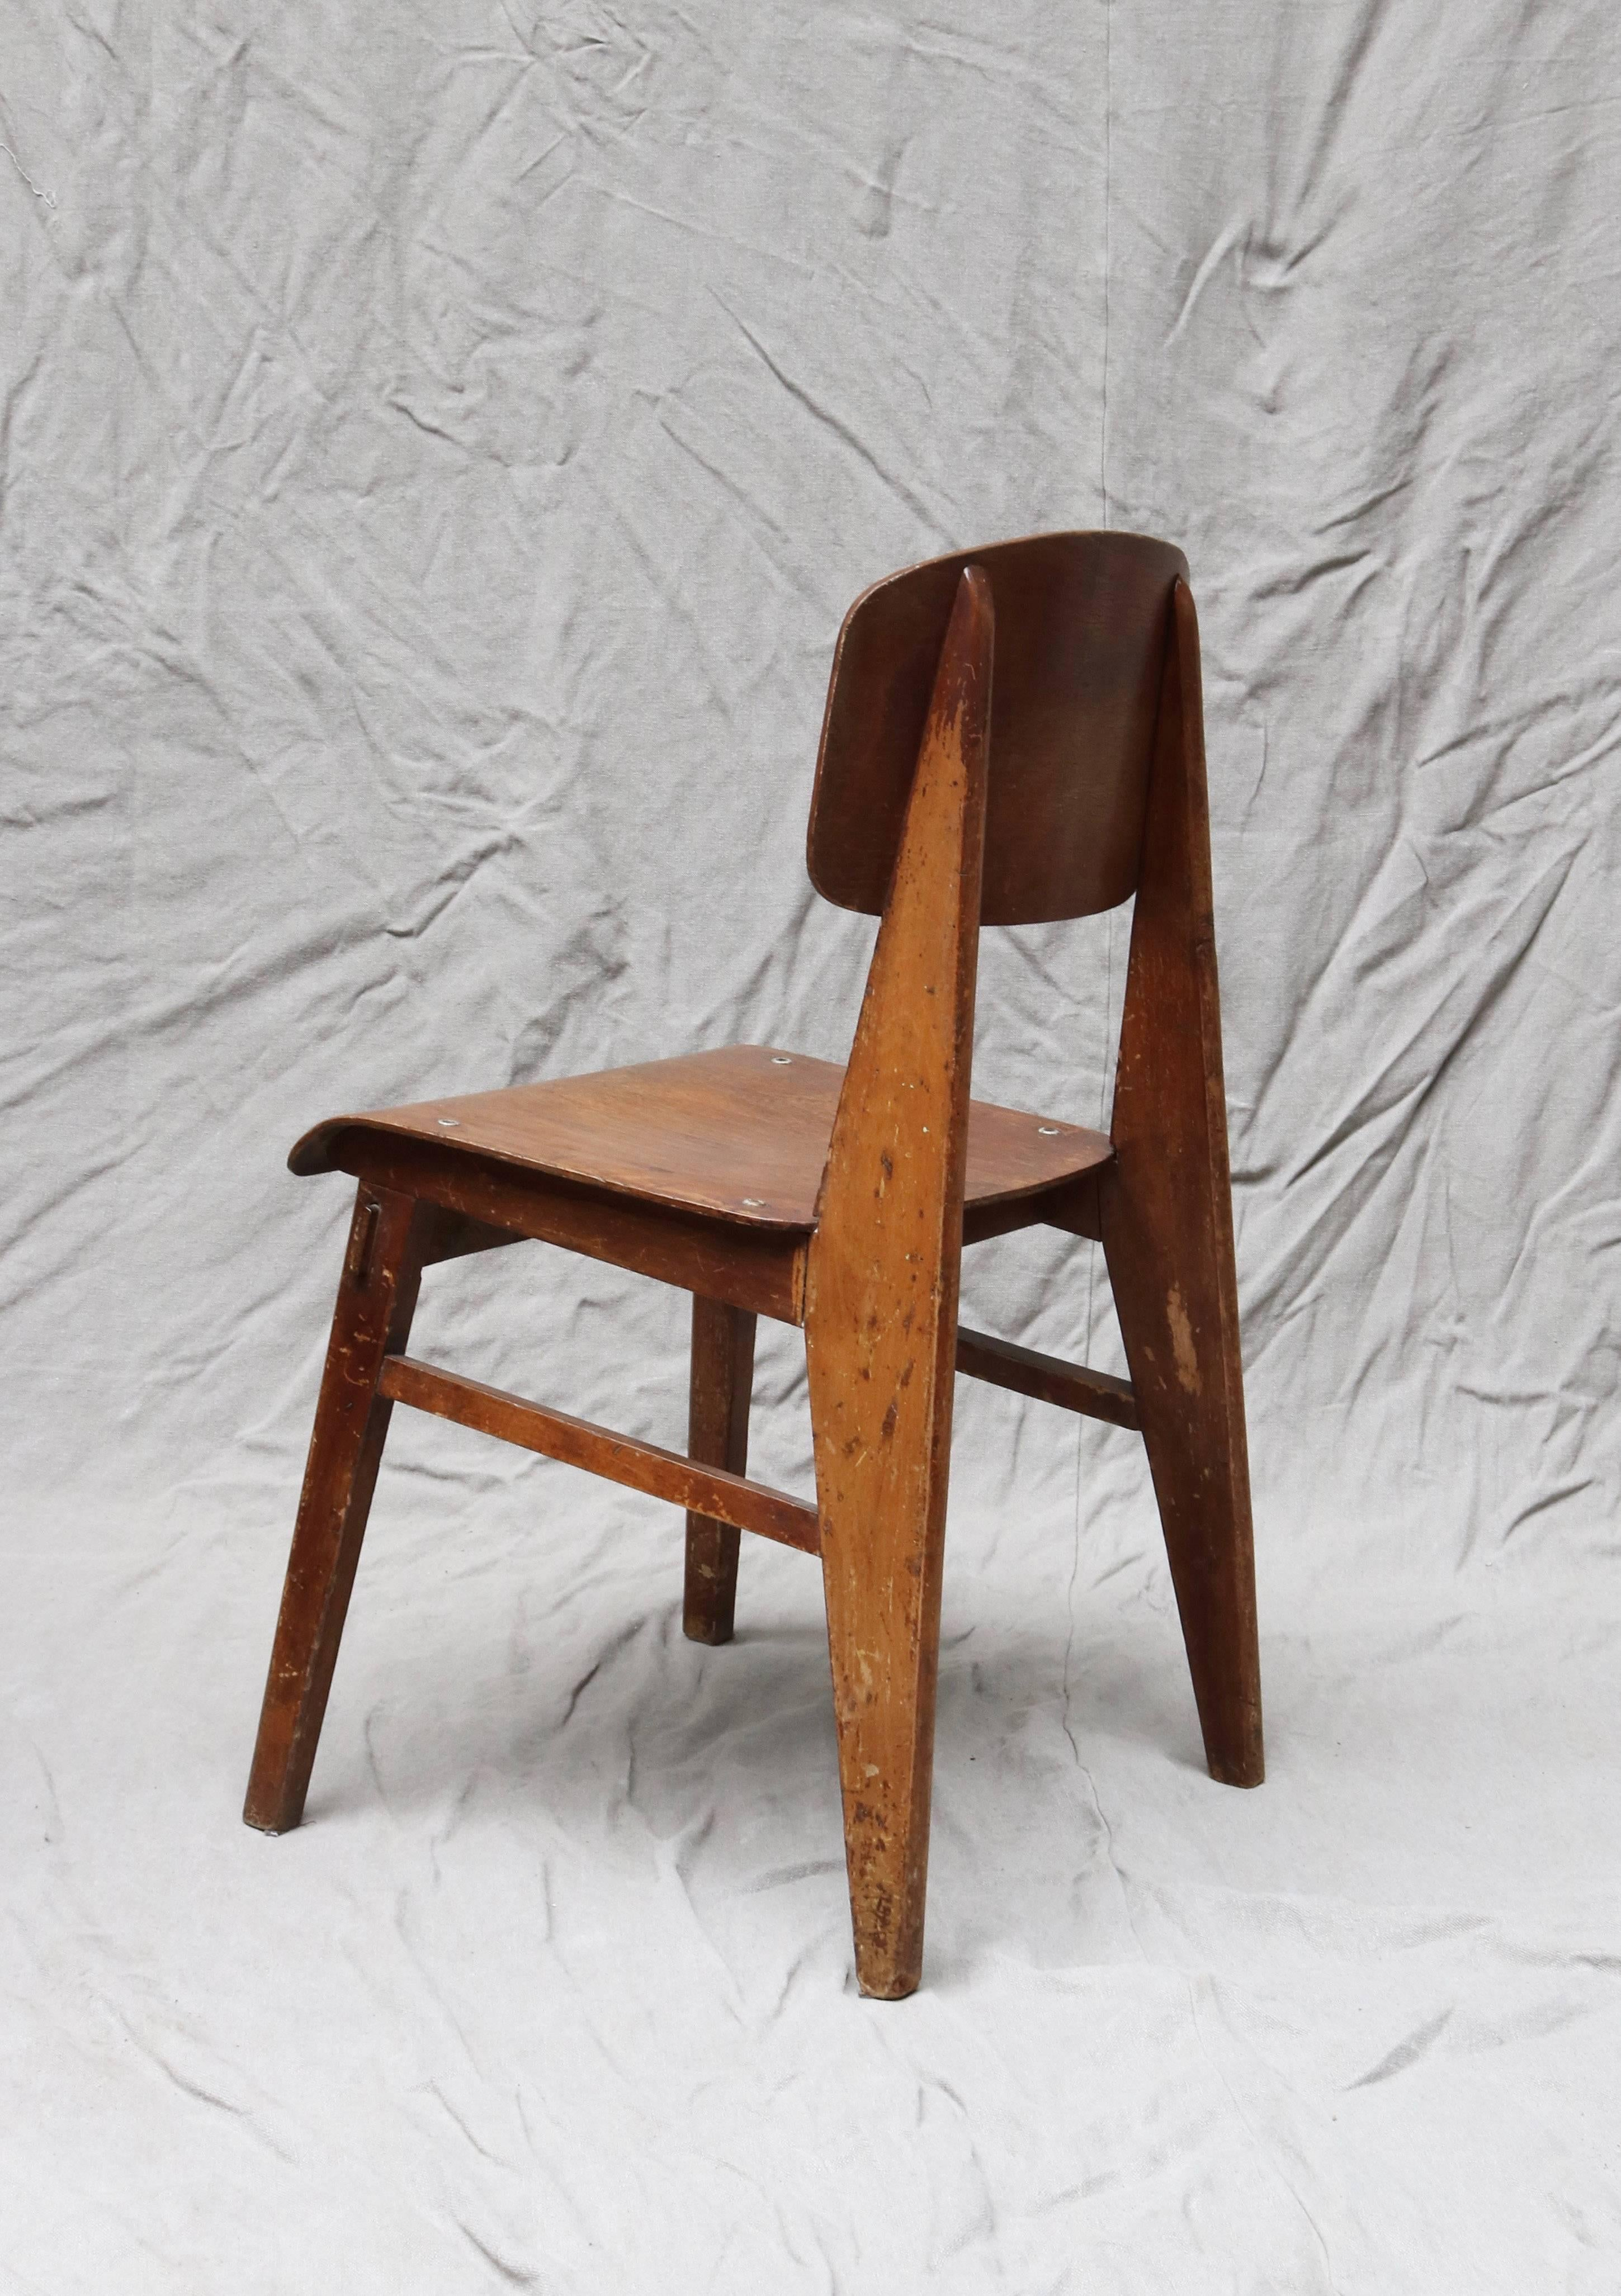 Mid Century Modern Unique Midcentury Wooden Chair By Jean Prouvé For Sale